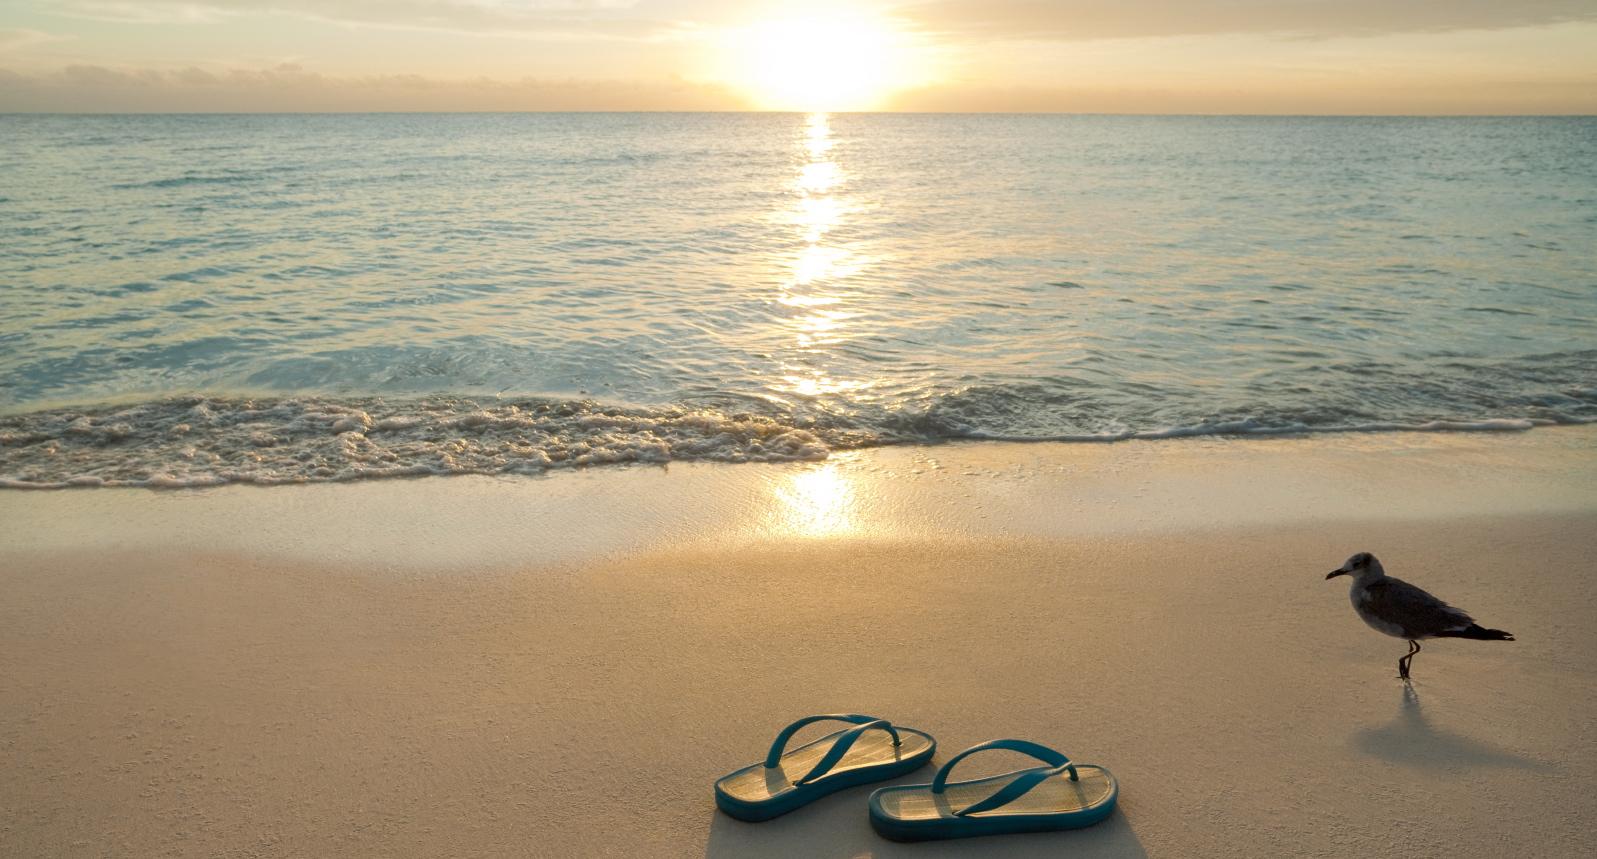 Sunrise on flip-flops and bird on the beach.